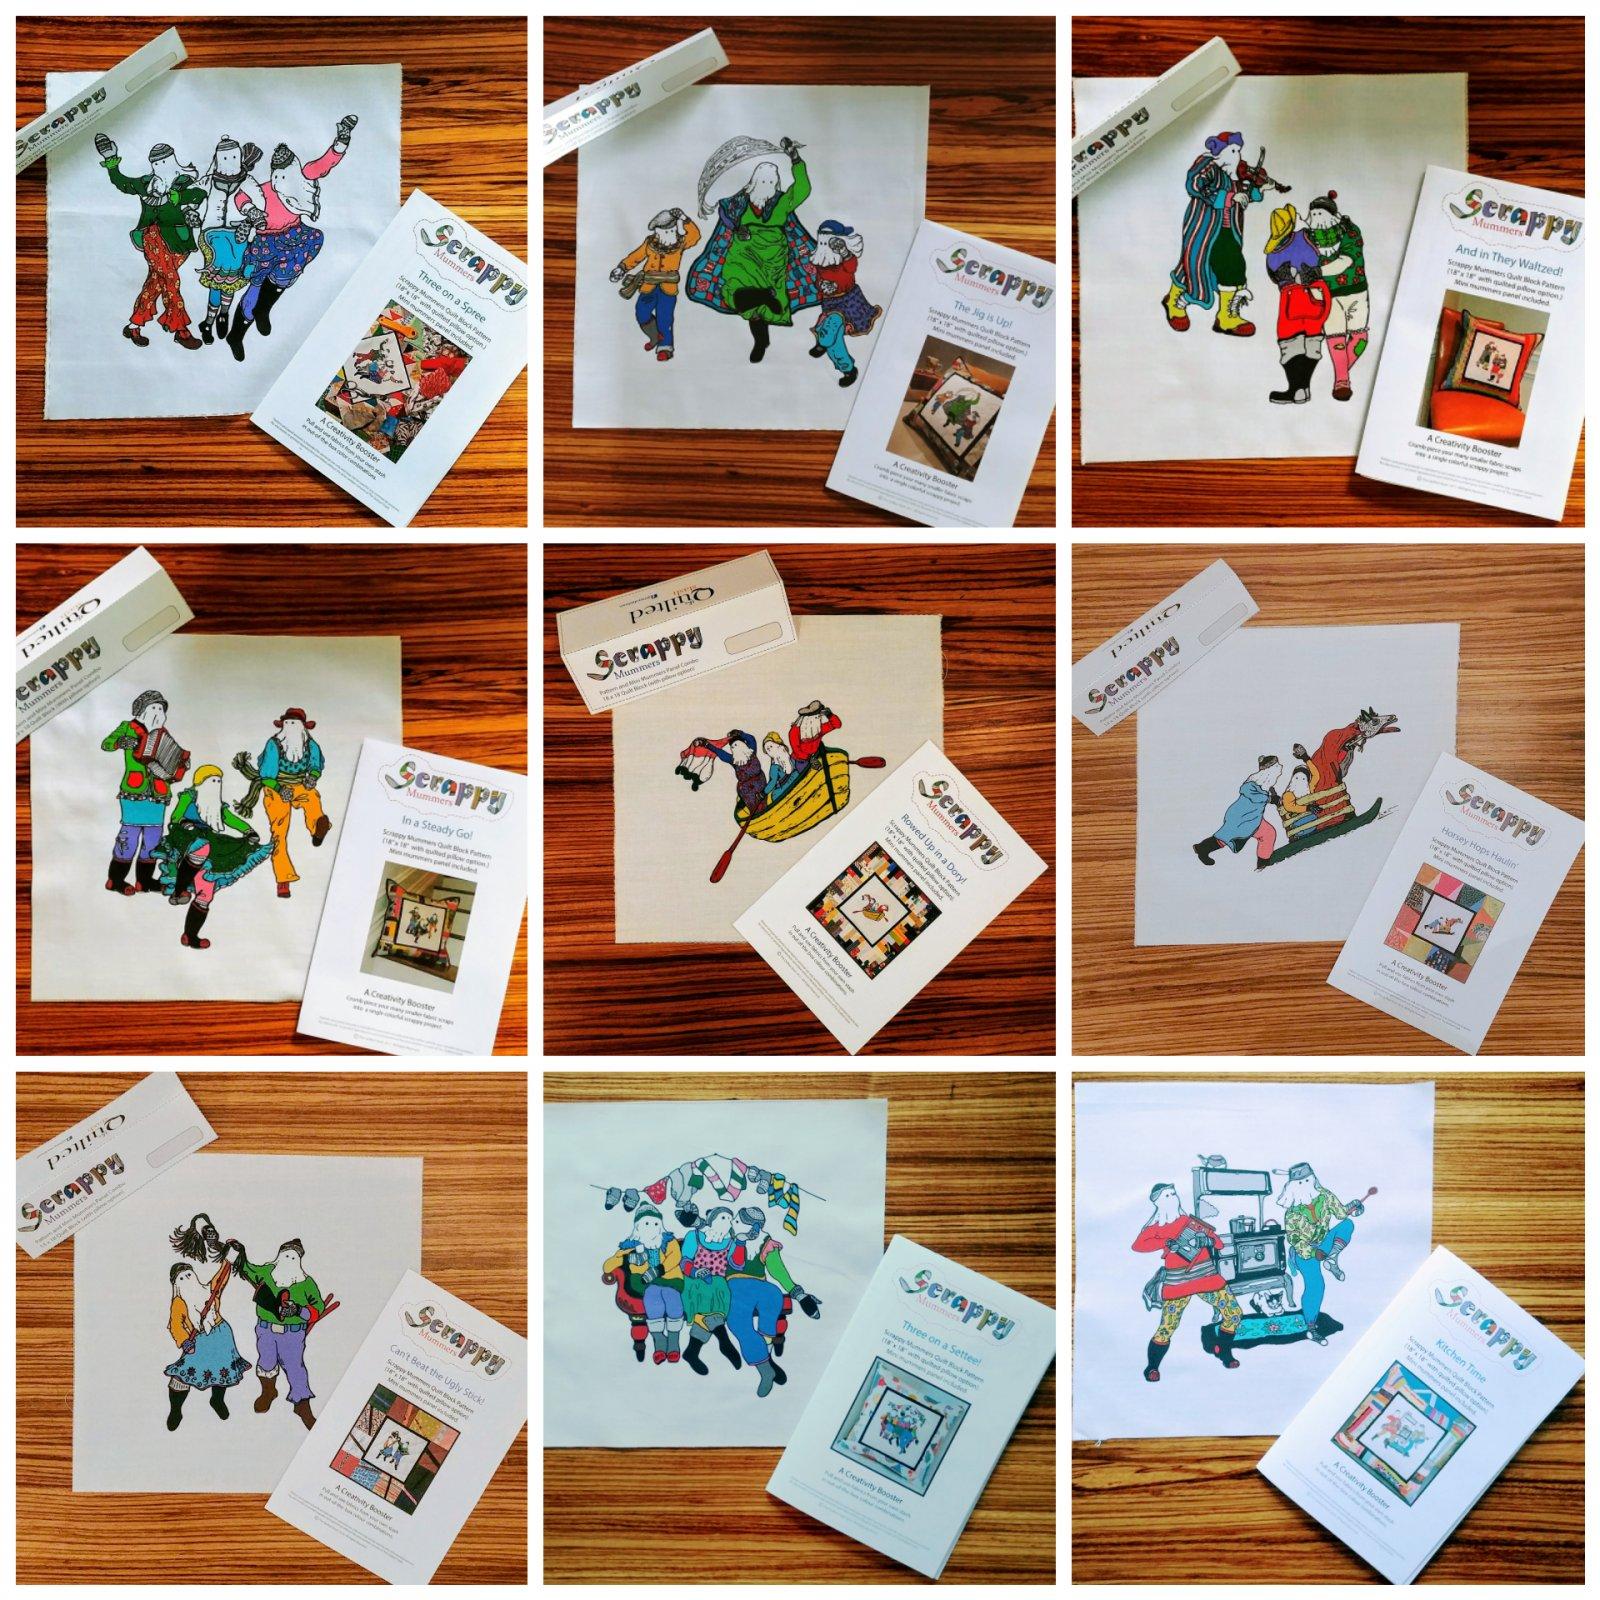 Scrappy Mummers Combos 1 - 9 (Complete Set)